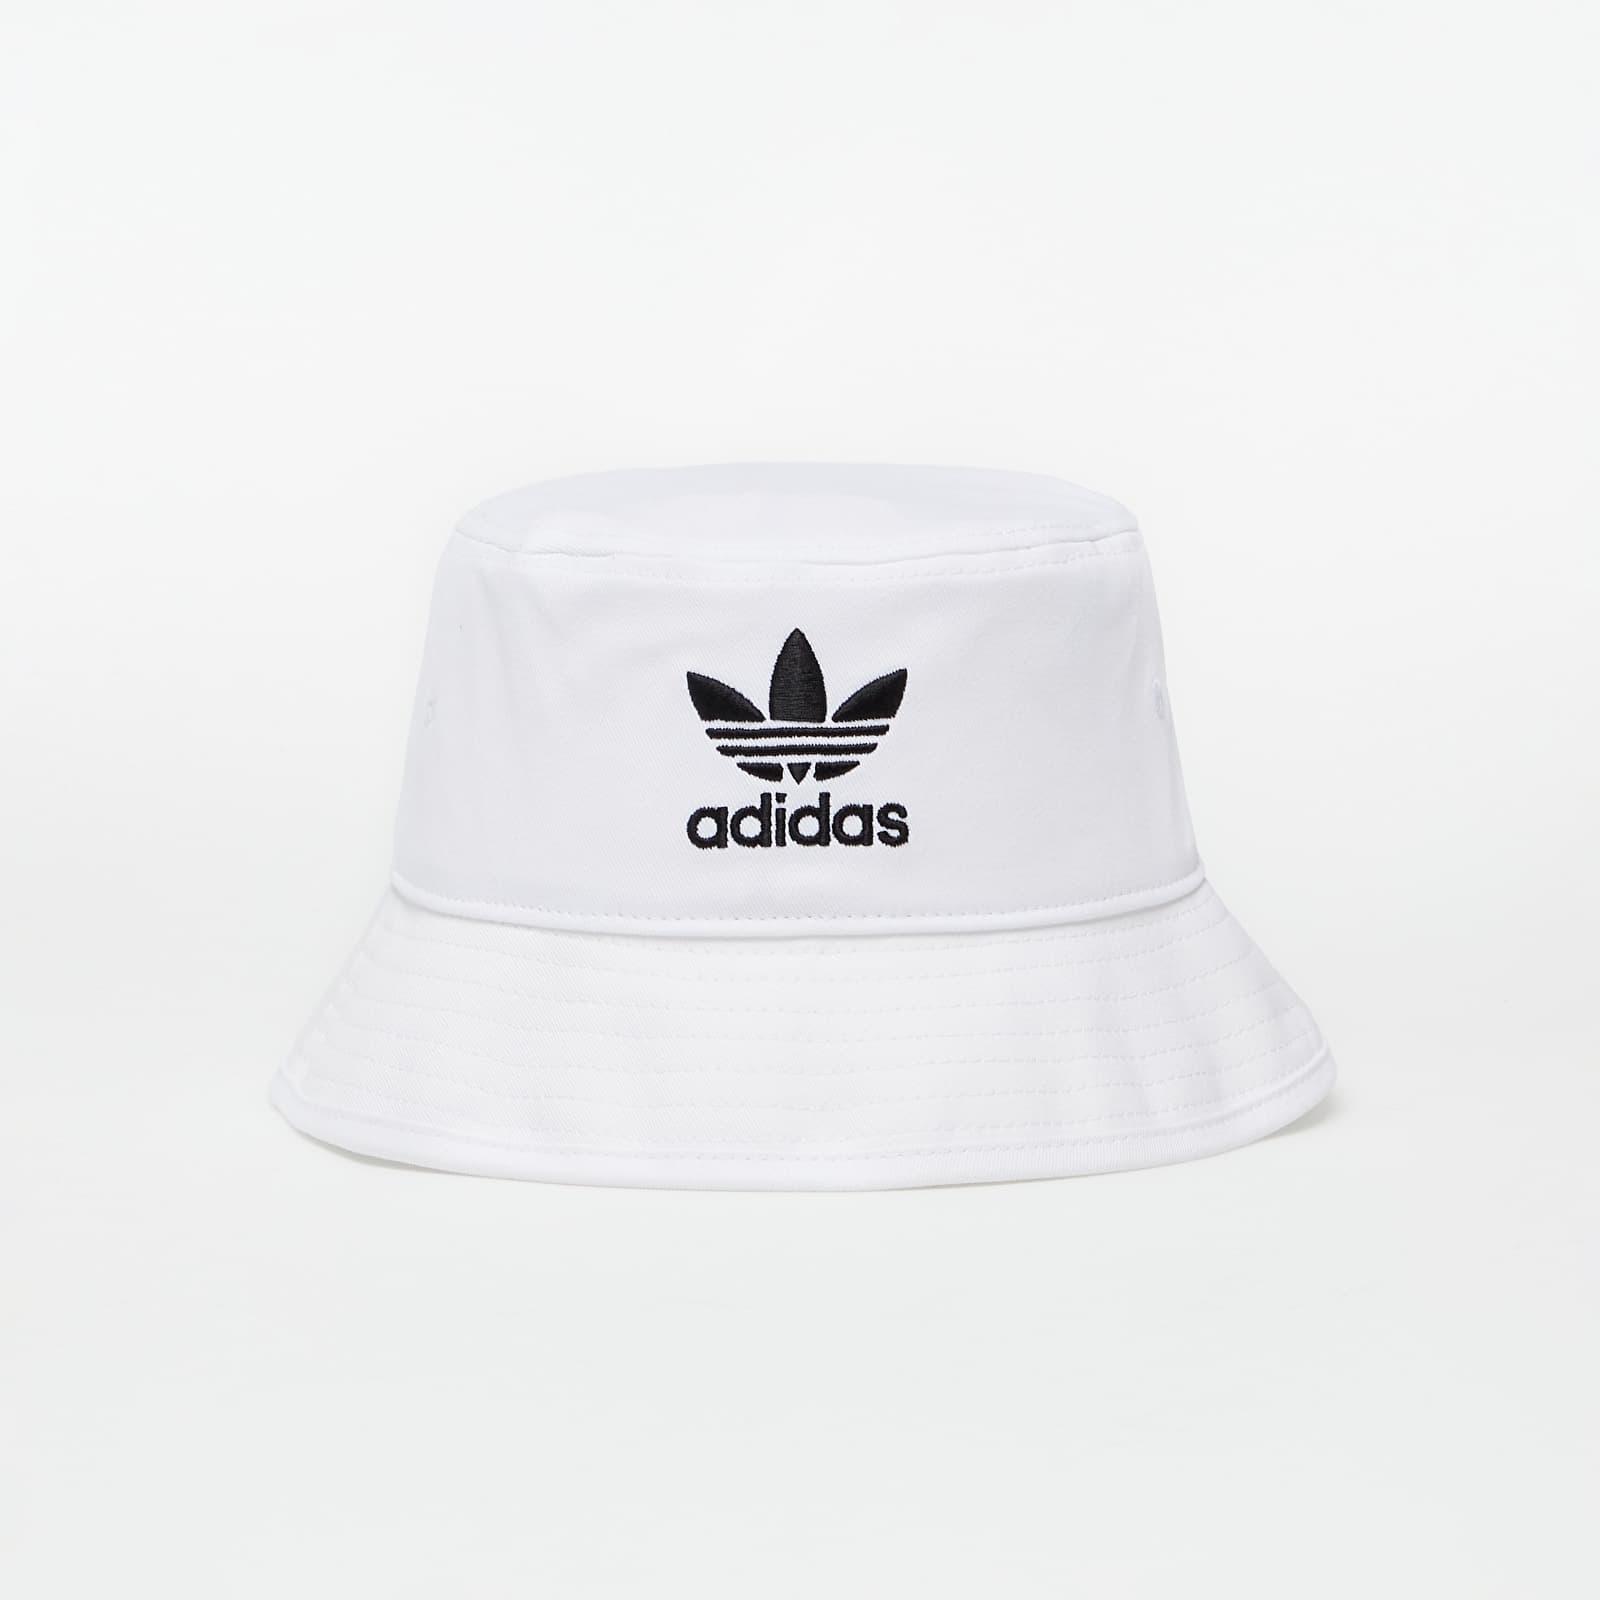 adidas Adicolor Trefoil Bucket Hat White OSFM